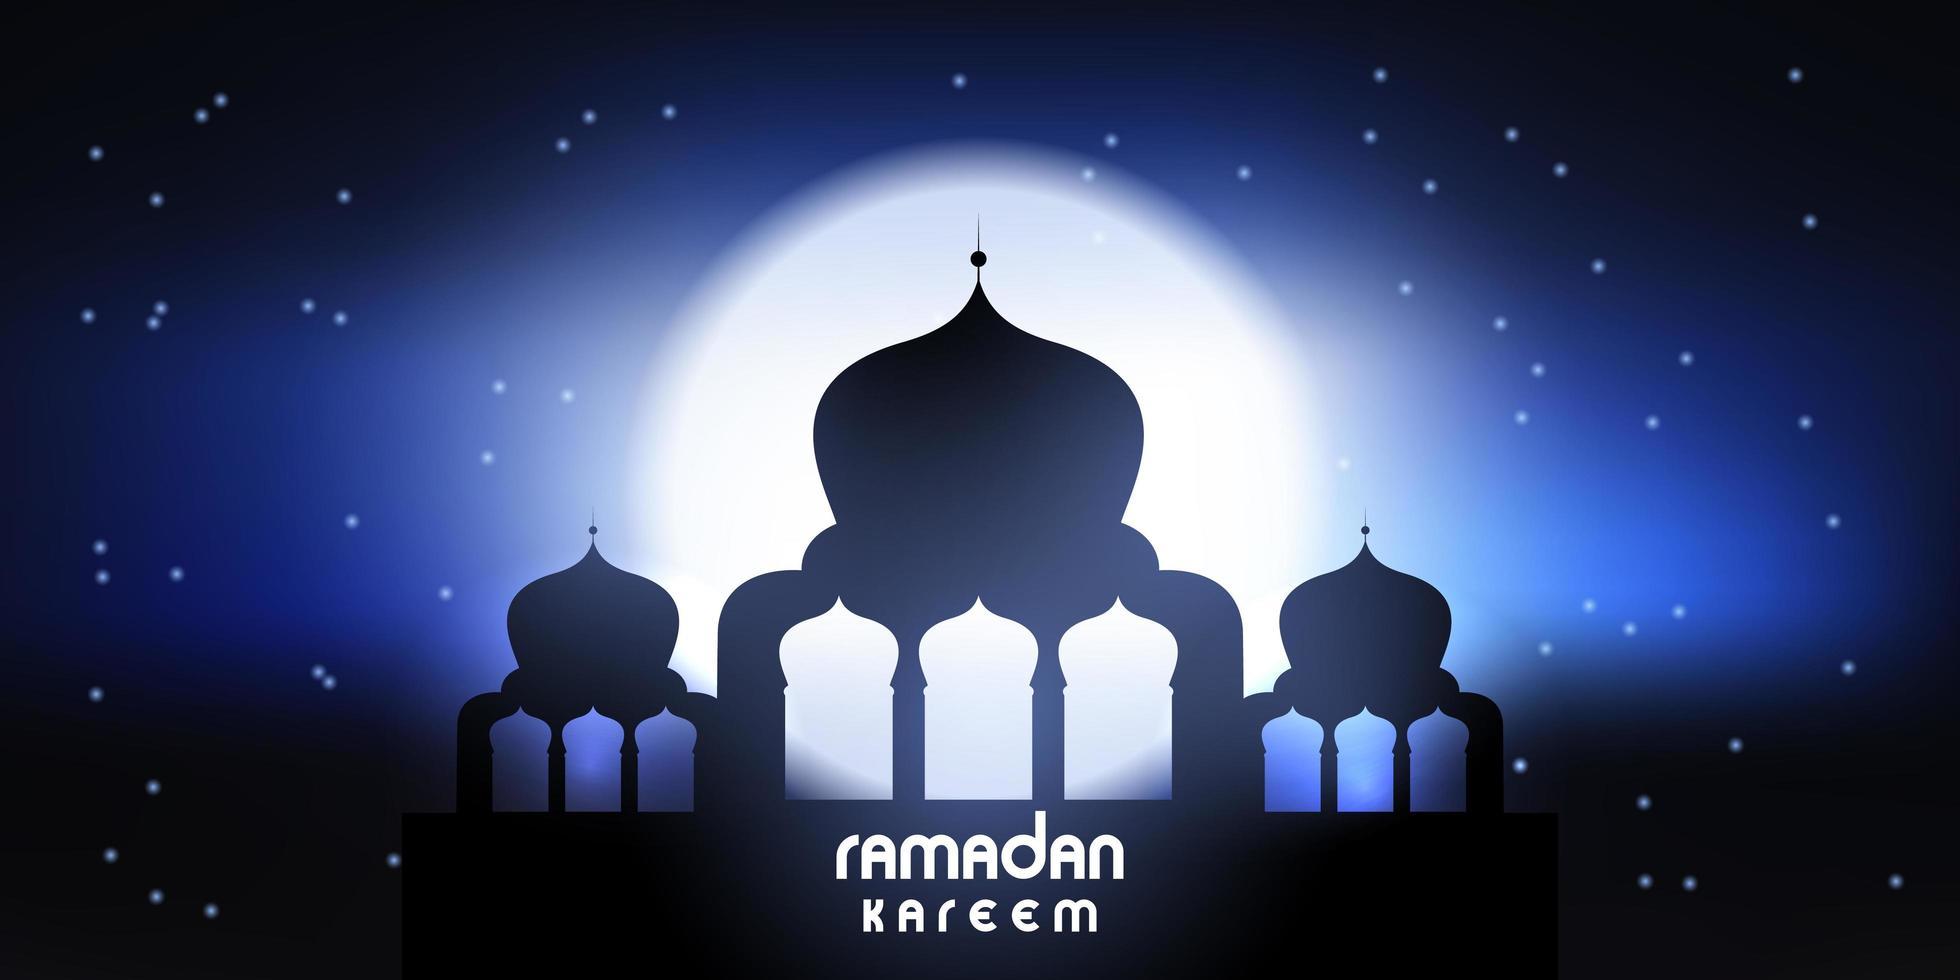 Ramadan Kareem banner with mosque silhouette vector